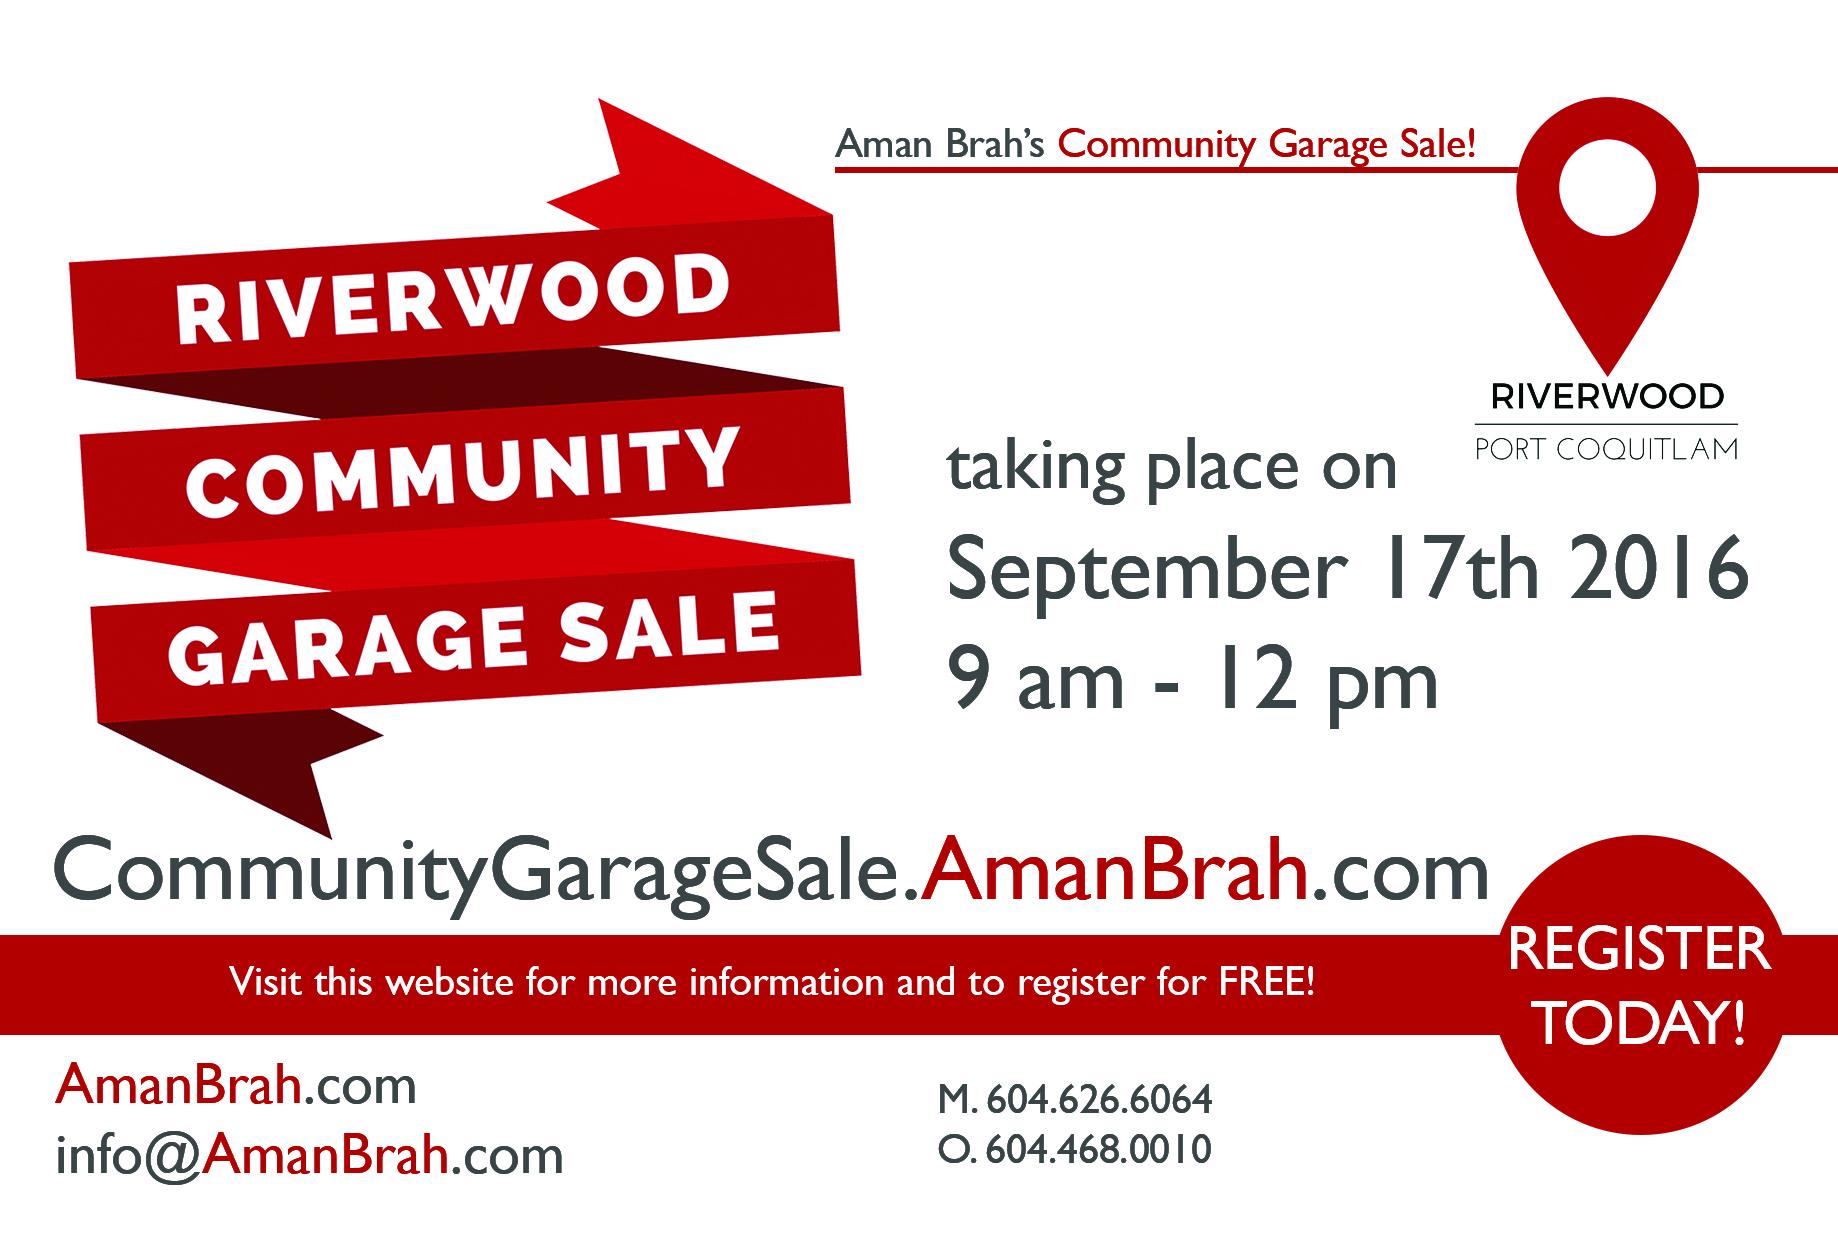 Riverwood Community Garage Sale 2016